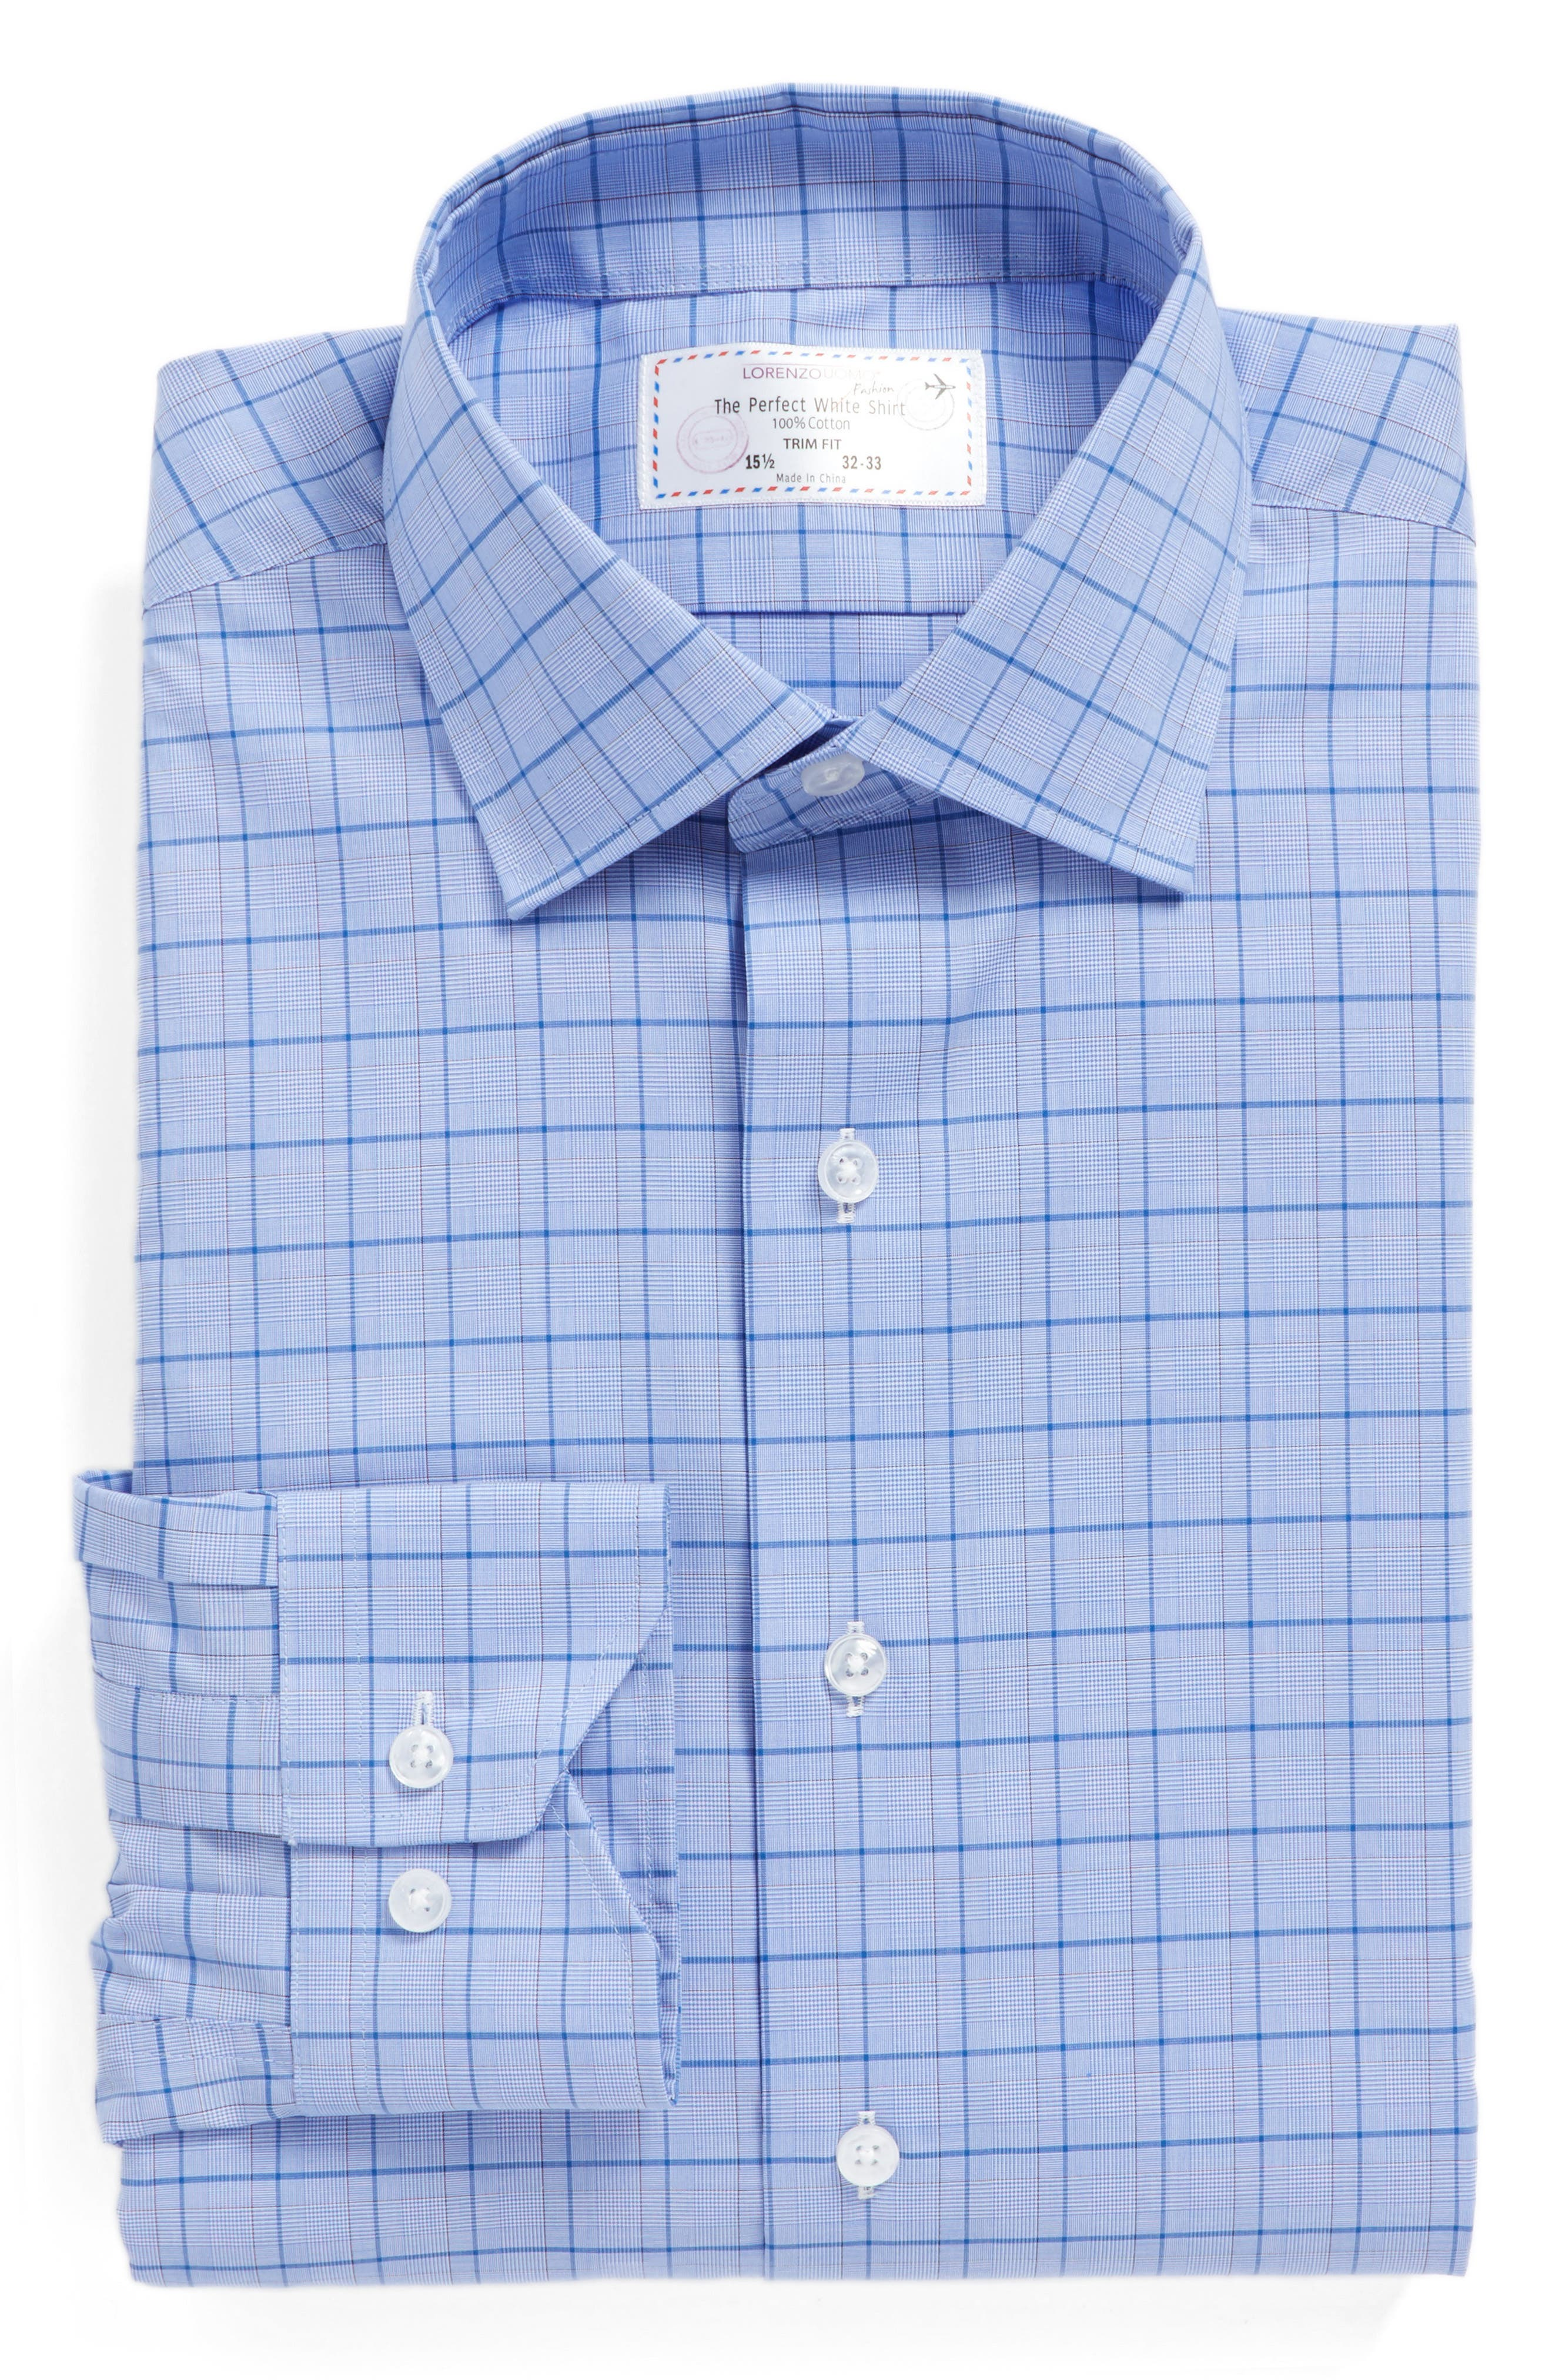 Main Image - Lorenzo Uomo Trim Fit Plaid Dress Shirt